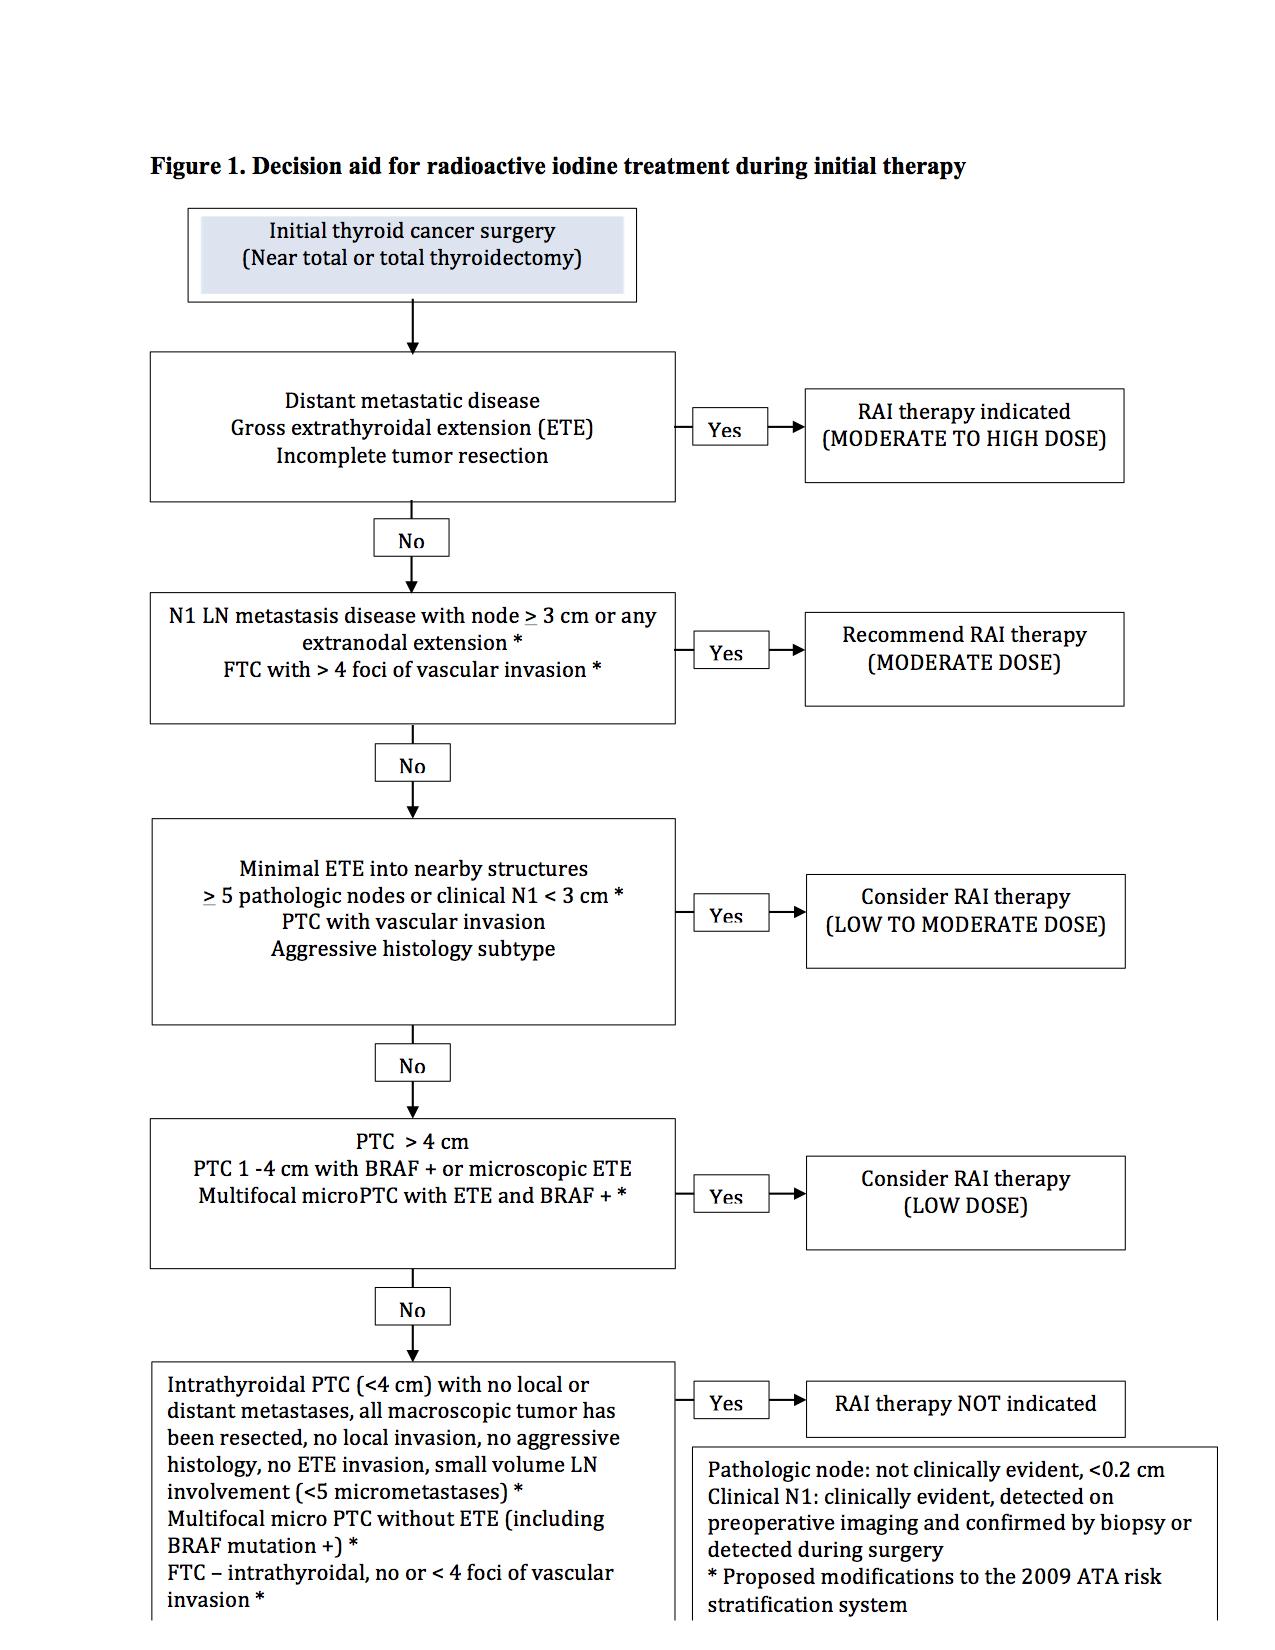 vaccino hpv trieste condylomata acuminata krebs